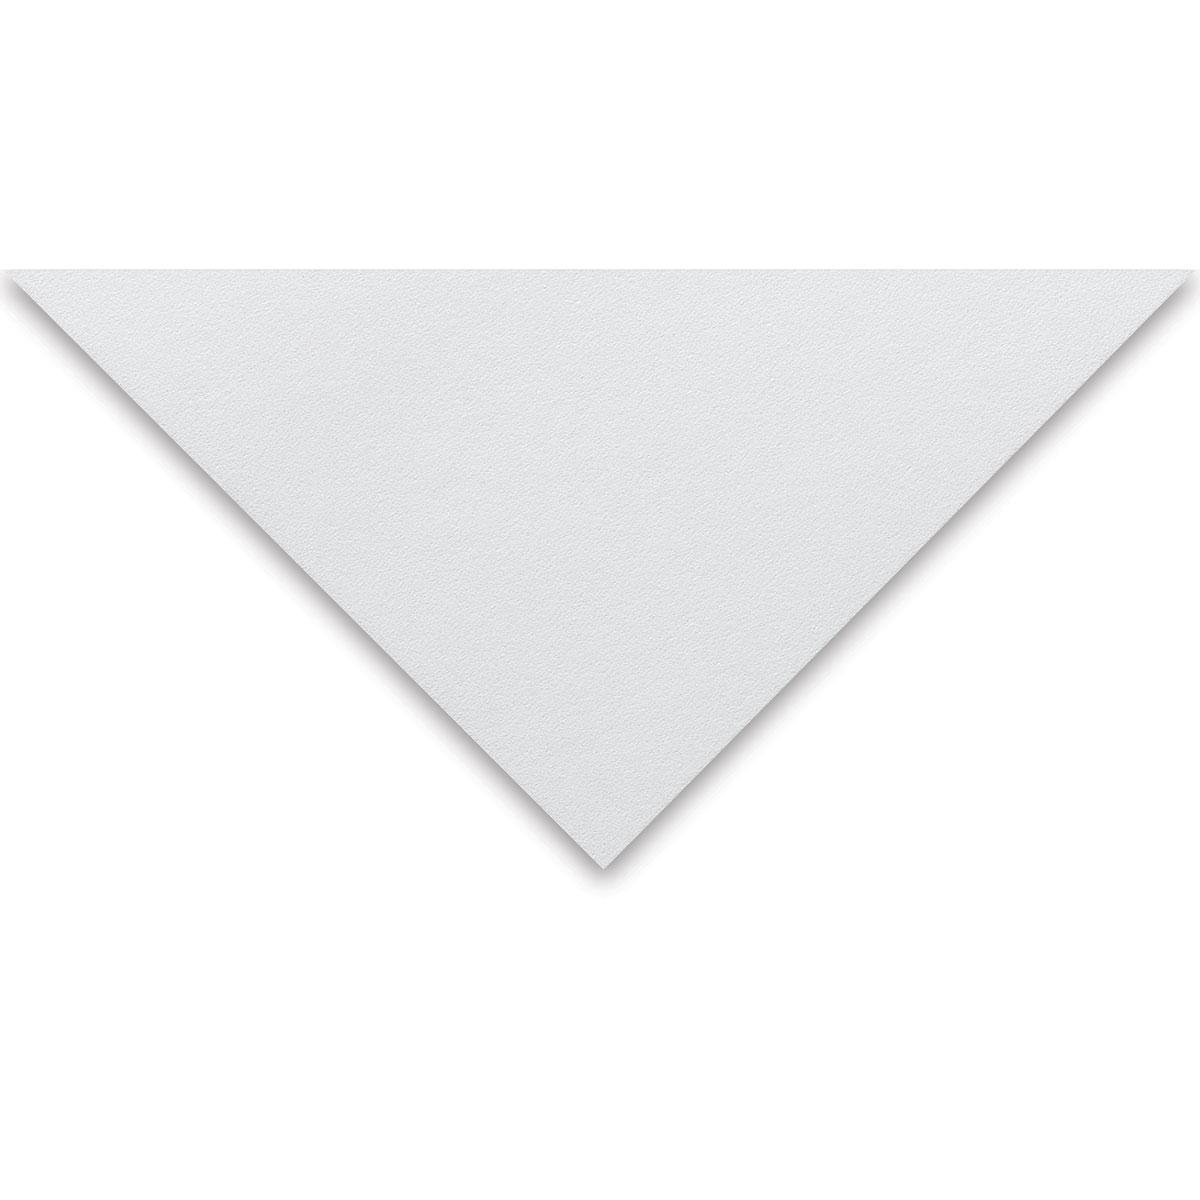 Crescent RagMat Museum Mounting Board - 32 x 40, White